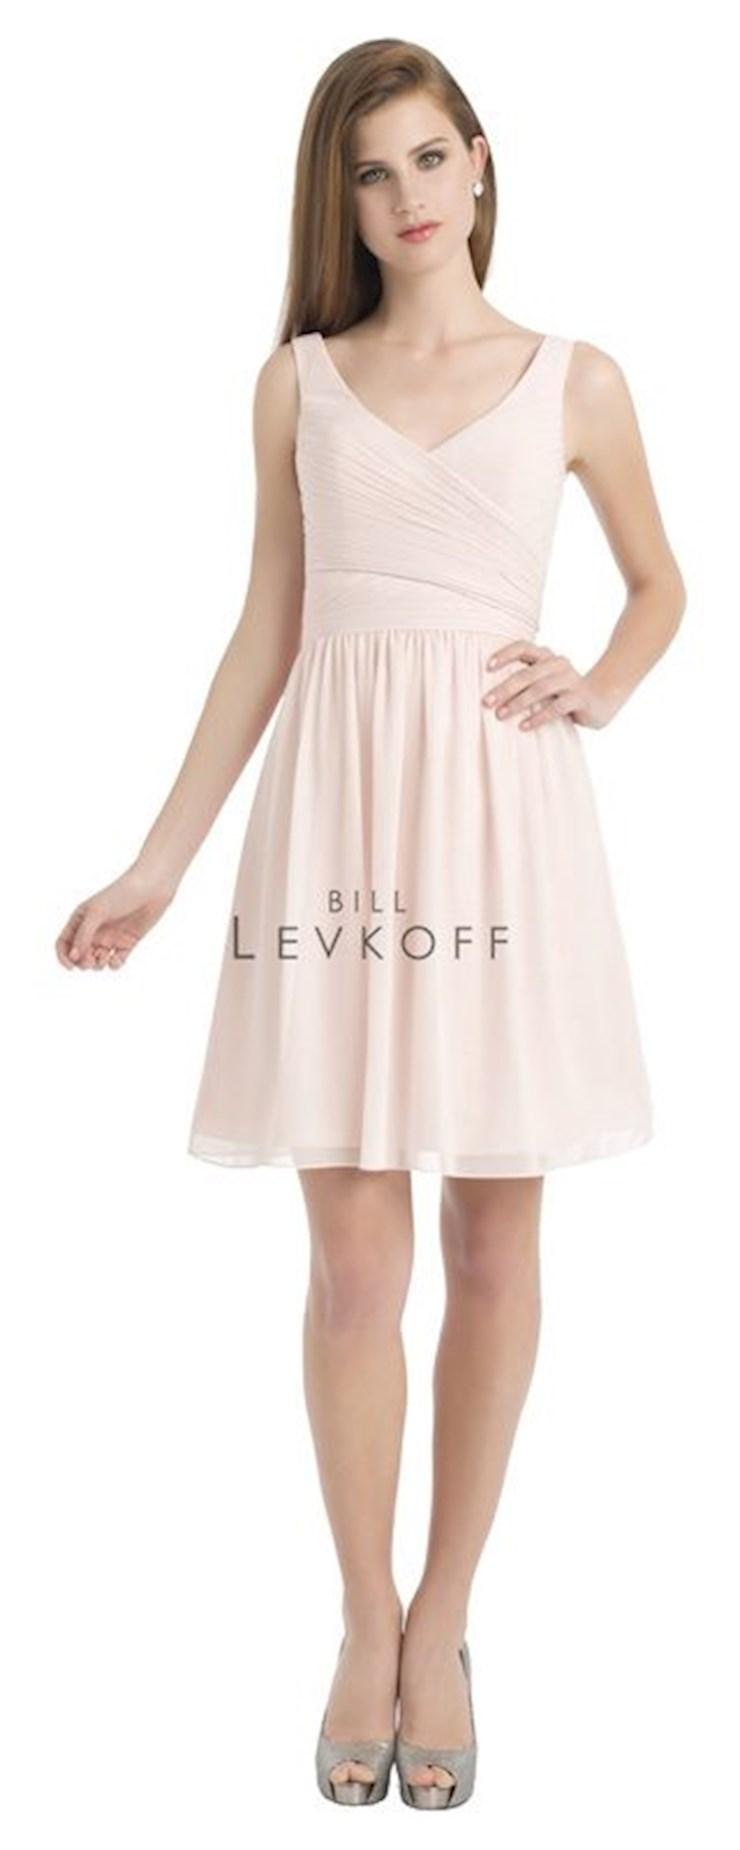 Bill Levkoff Style #725